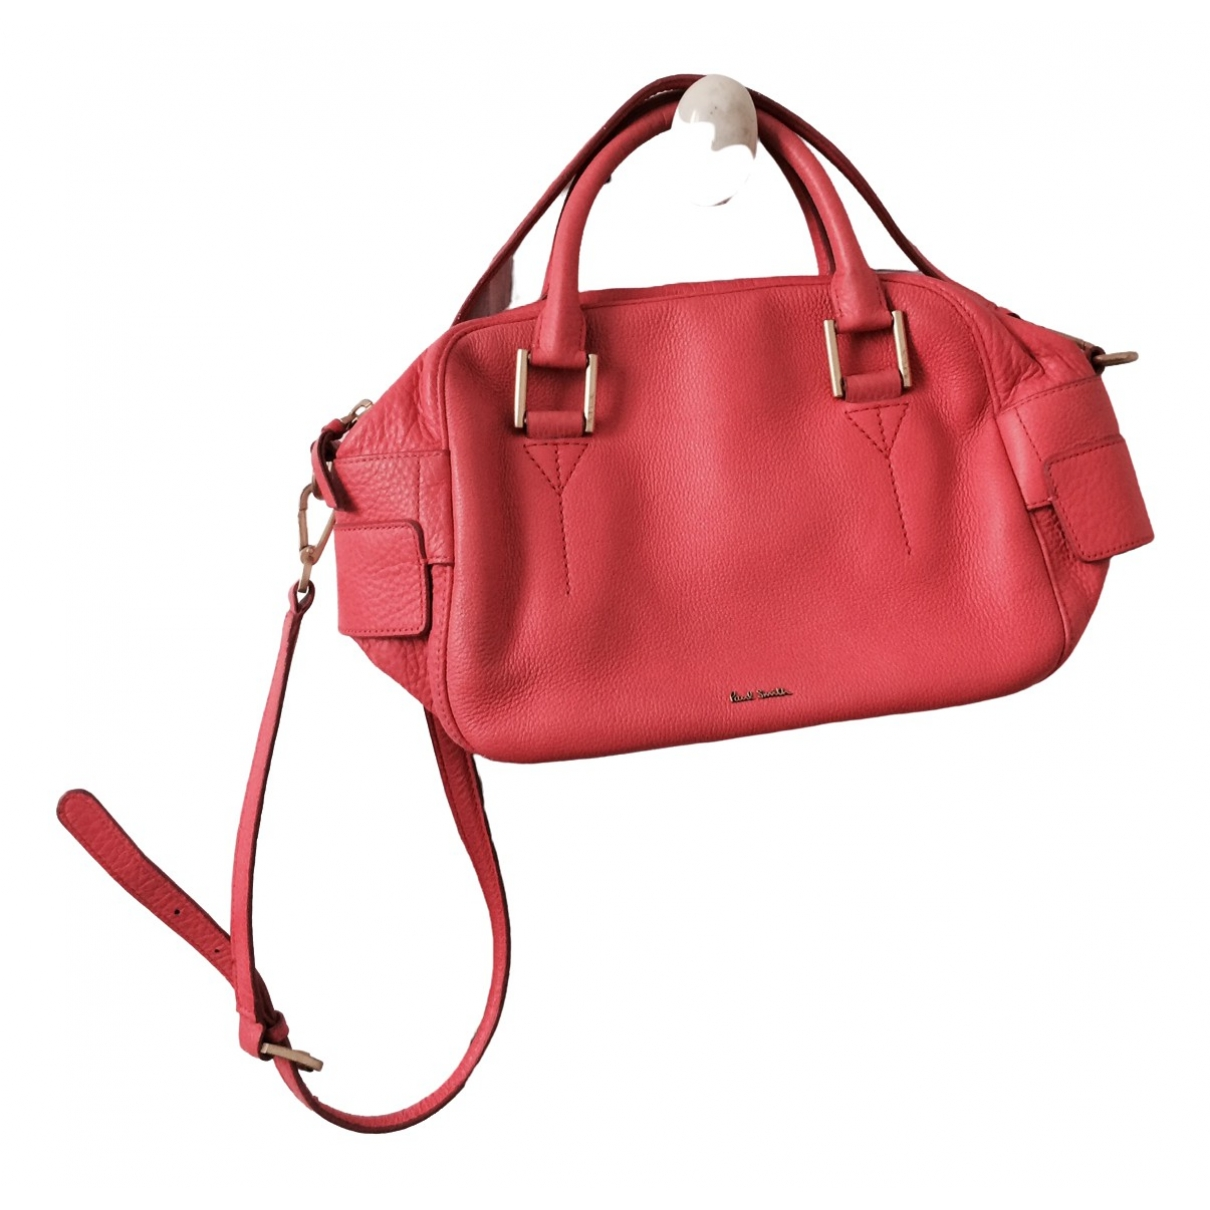 Paul Smith \N Pink Leather handbag for Women \N